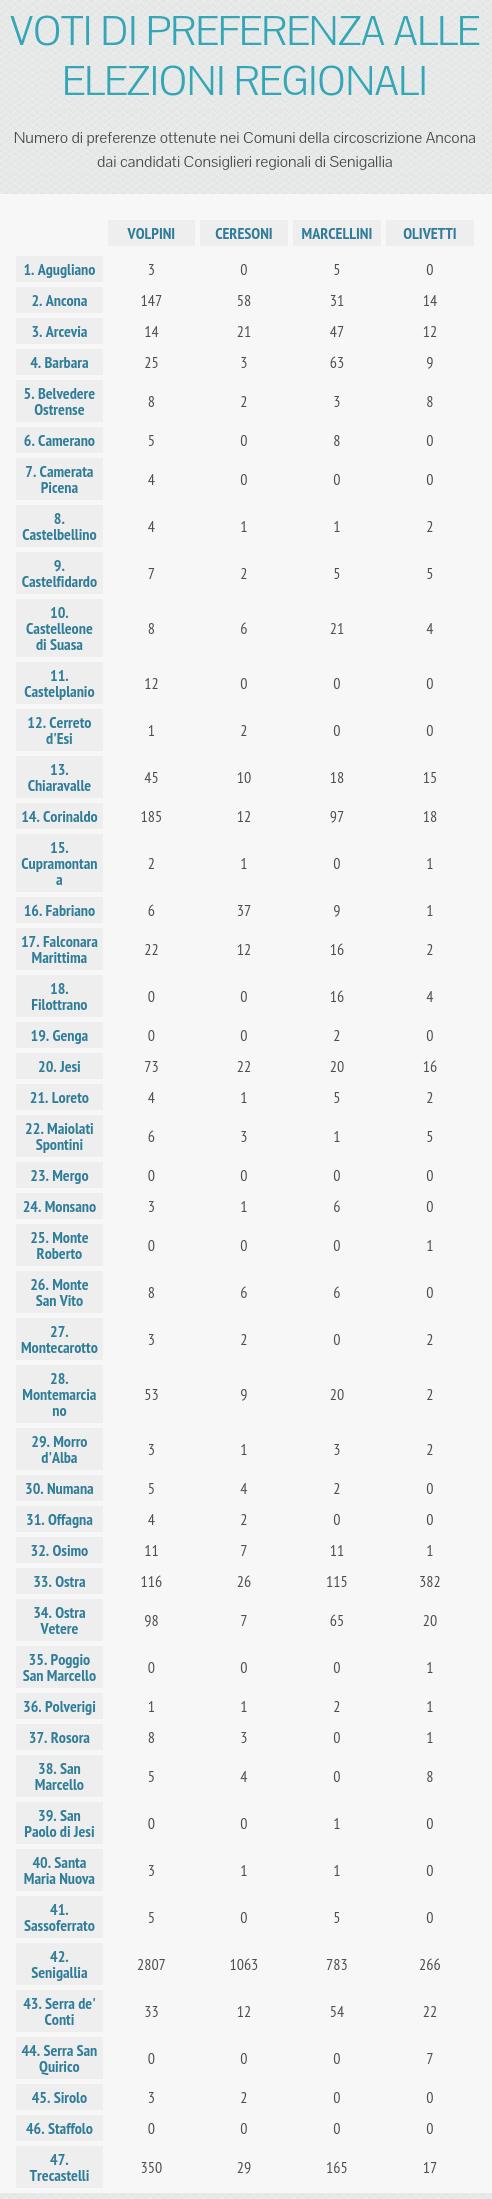 om-infografica-2015_15_regionali-2015-preferenze-comuni_1